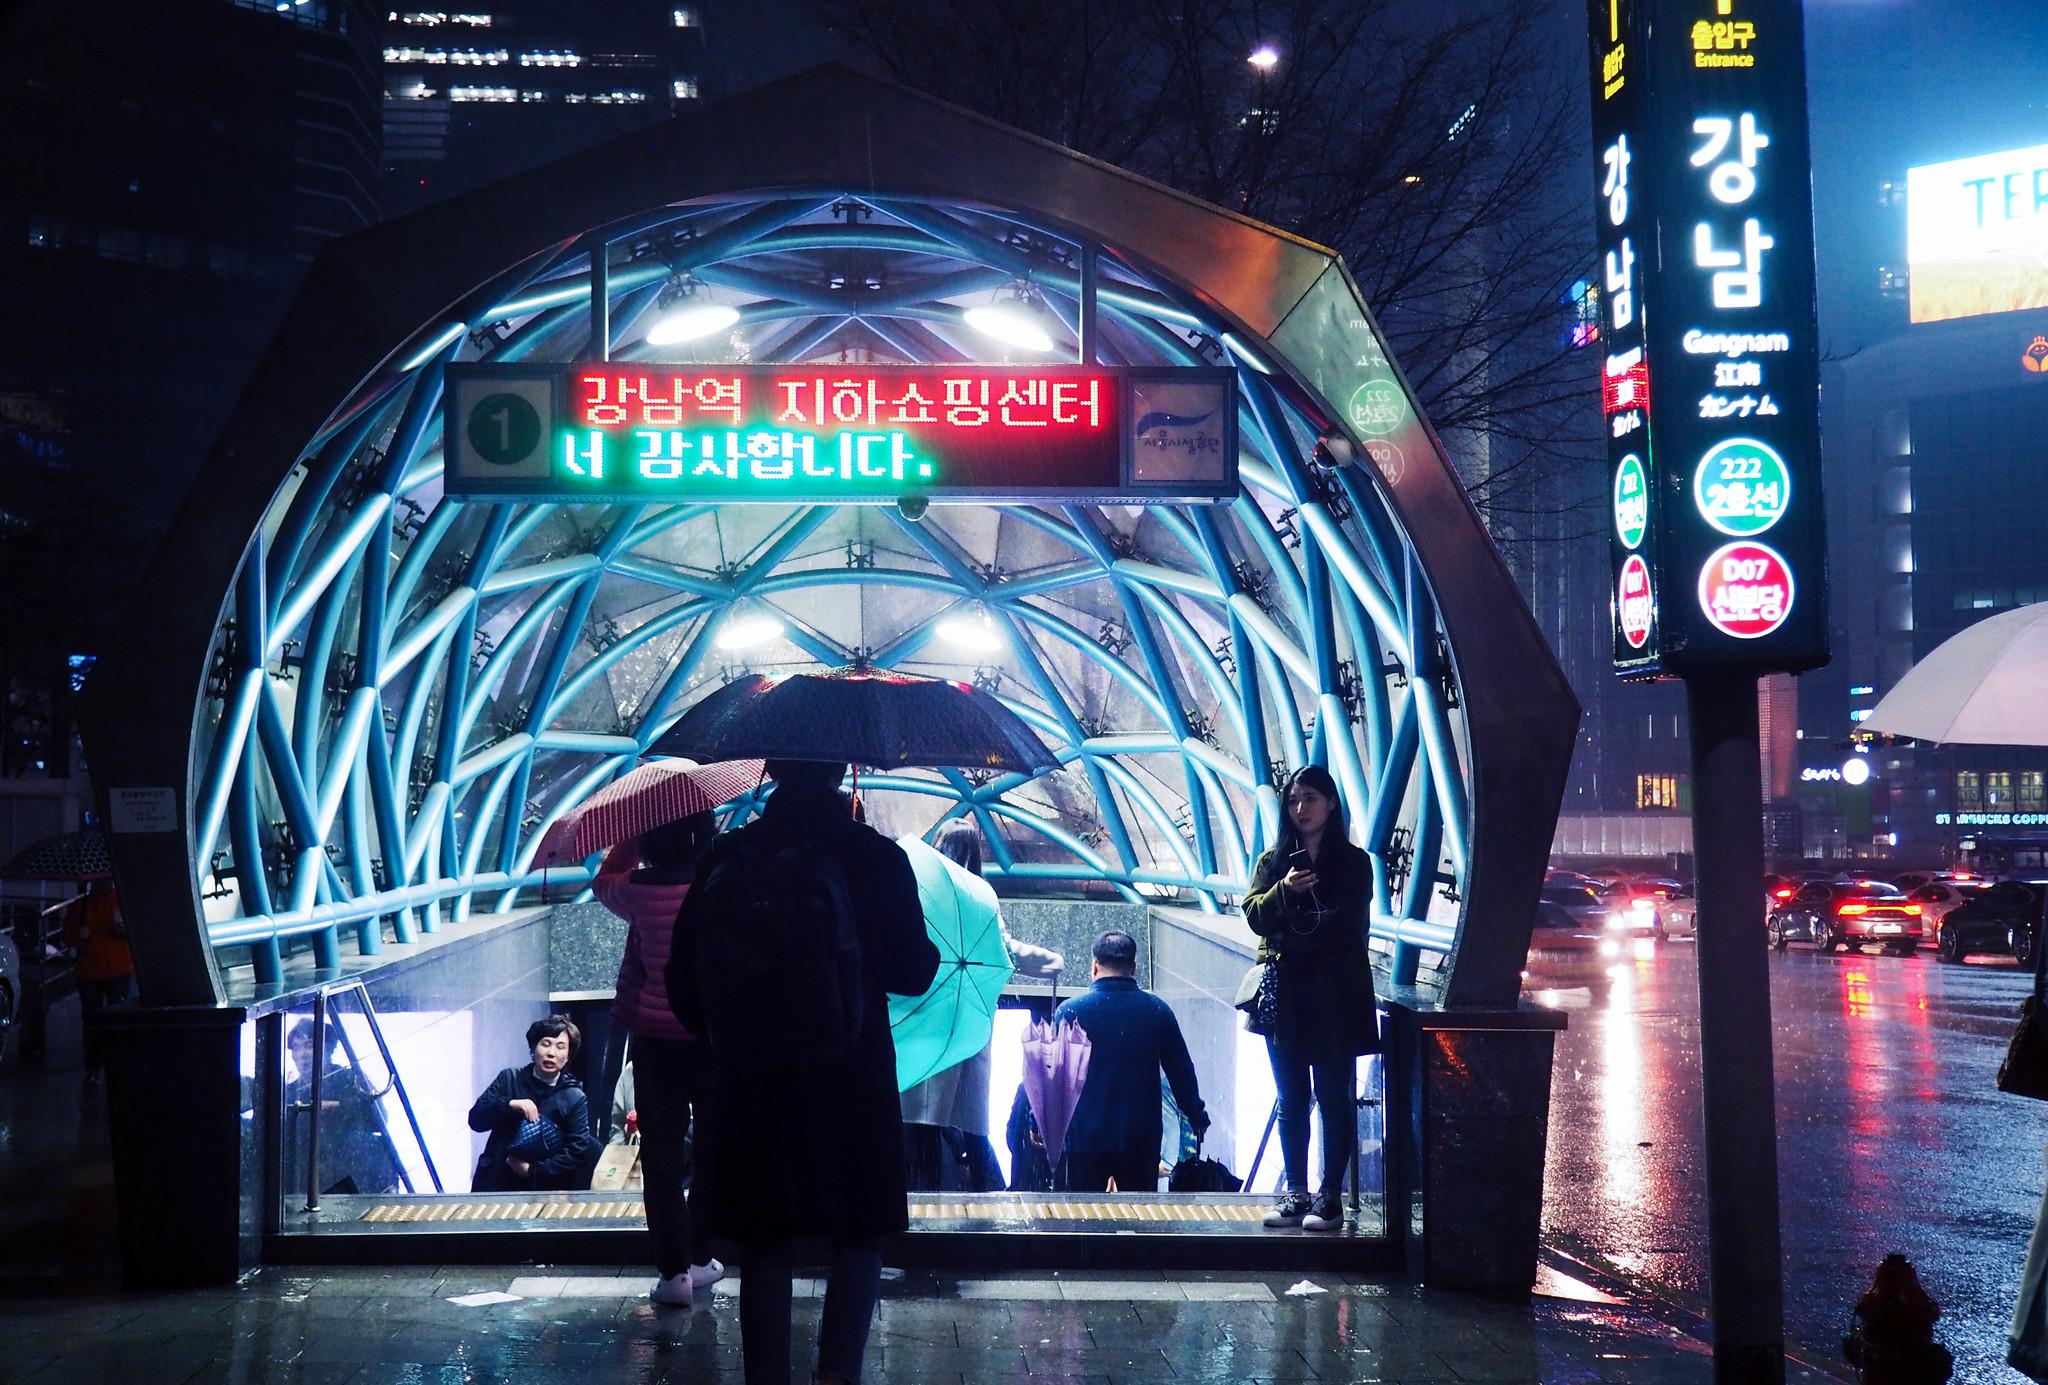 Gangnam Station Dome Seoul South Korea Travel Guide 2019_effected